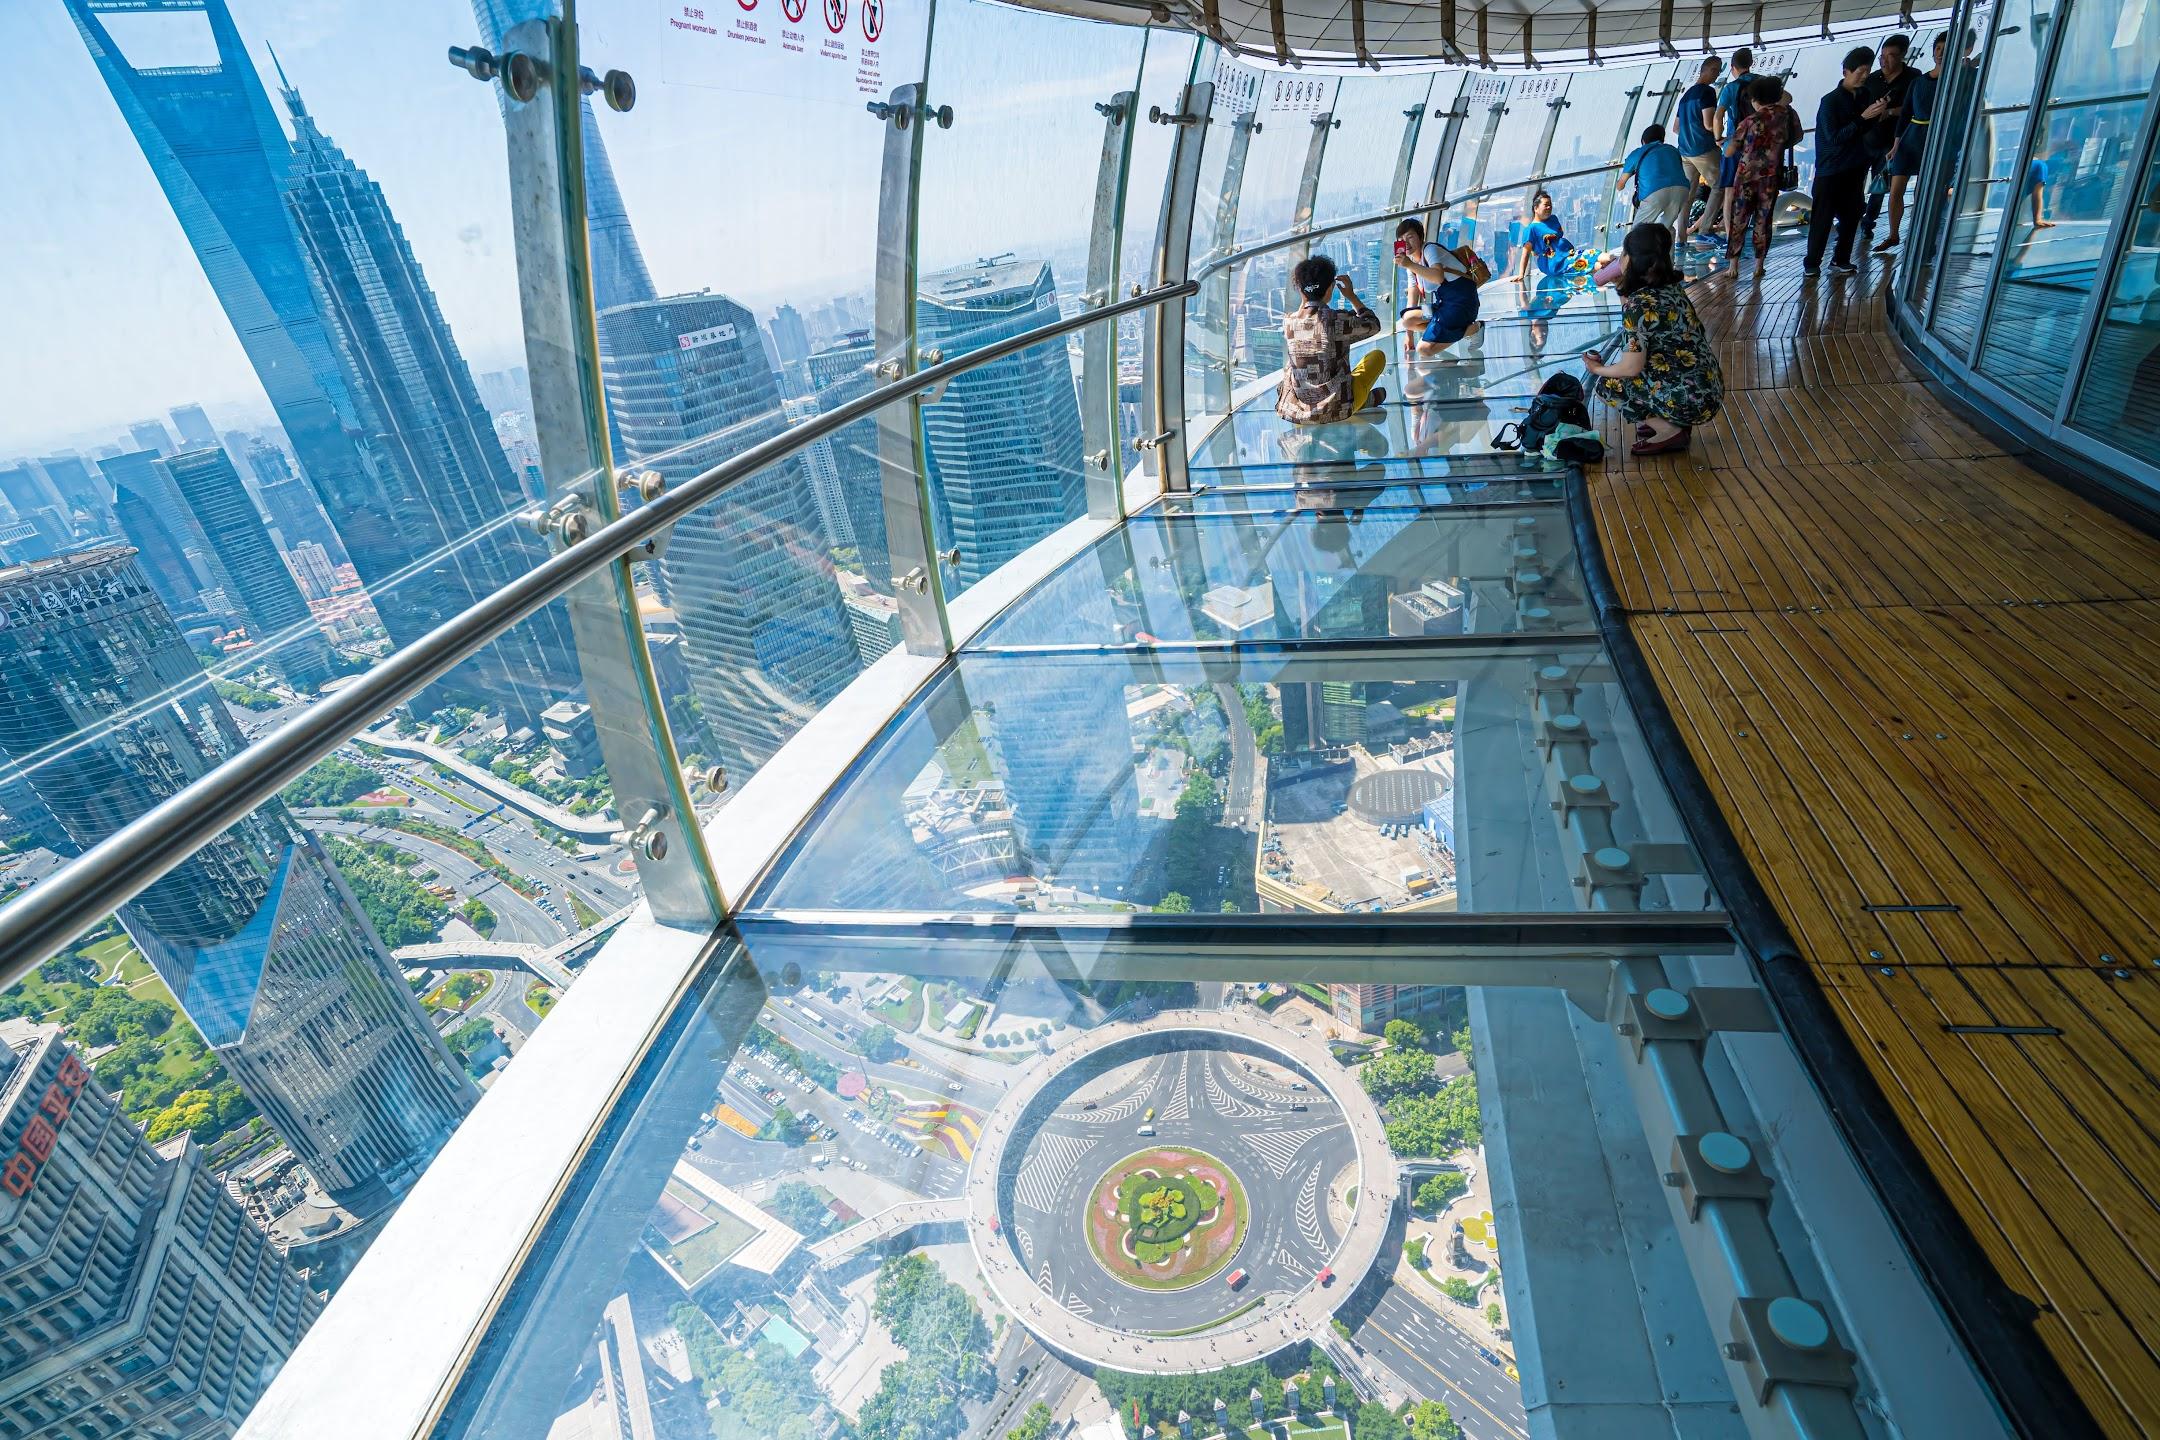 Shanghai Oriental Pearl Tower observation deck5